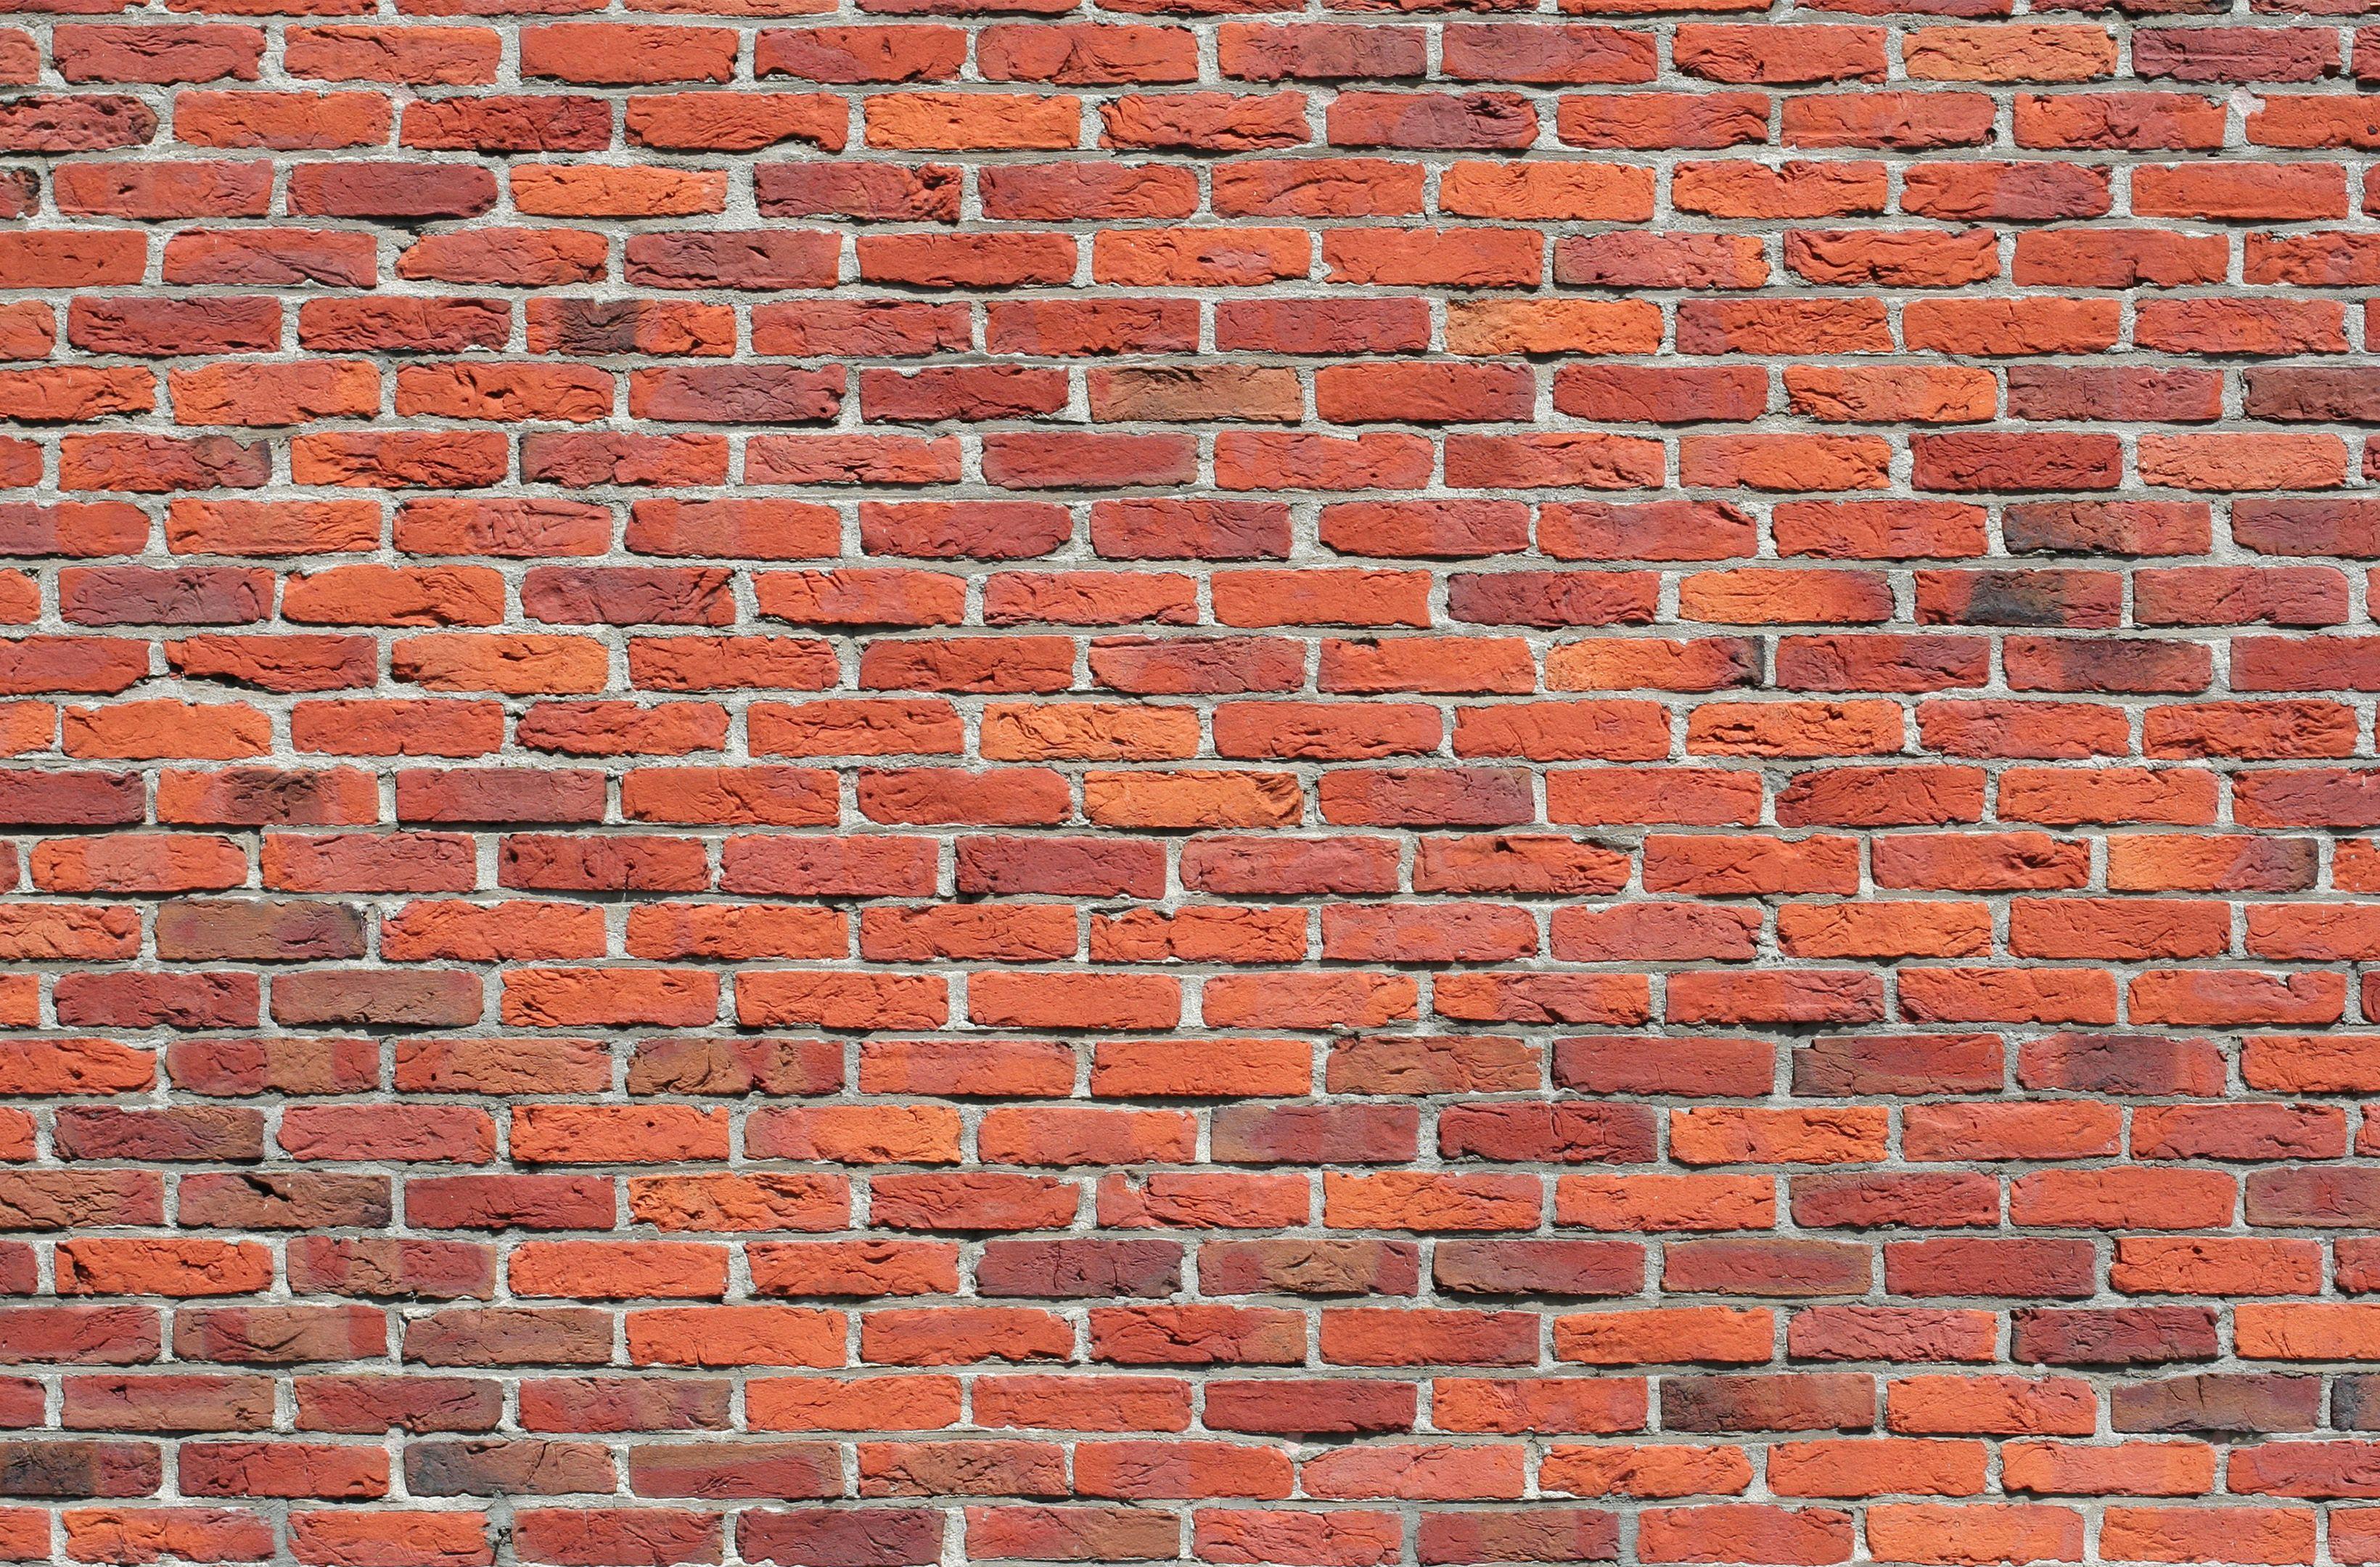 Brick Wall Texture Download Photo Image Bricks Brick Masonry Bricks Wall Background Texture